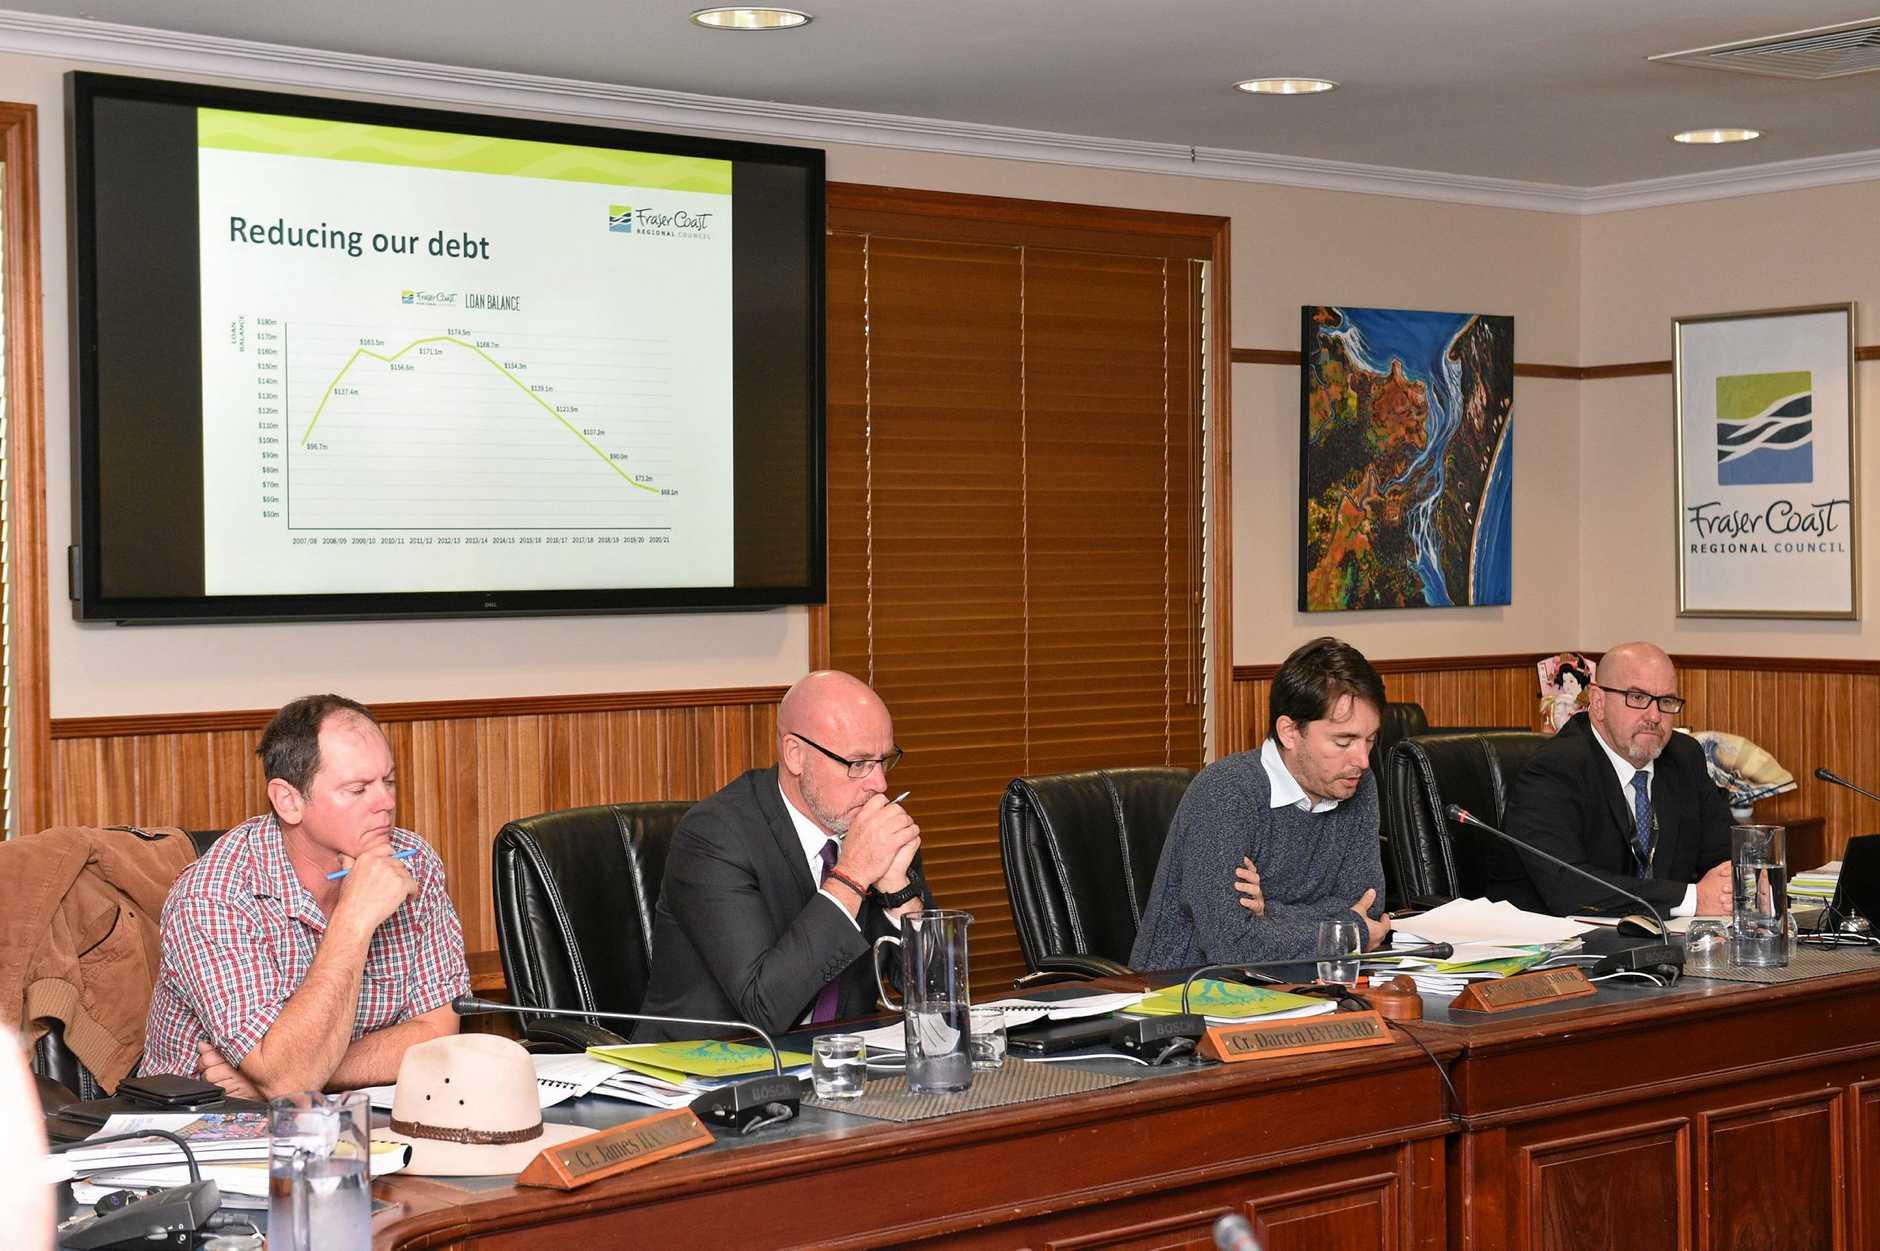 BIG BUDGET SPEND: Fraser Coast mayor George Seymour (centre) reads his budget speech as councillor James Hansen, deputy mayor Darren Everard and CEO Ken Diehm listen.